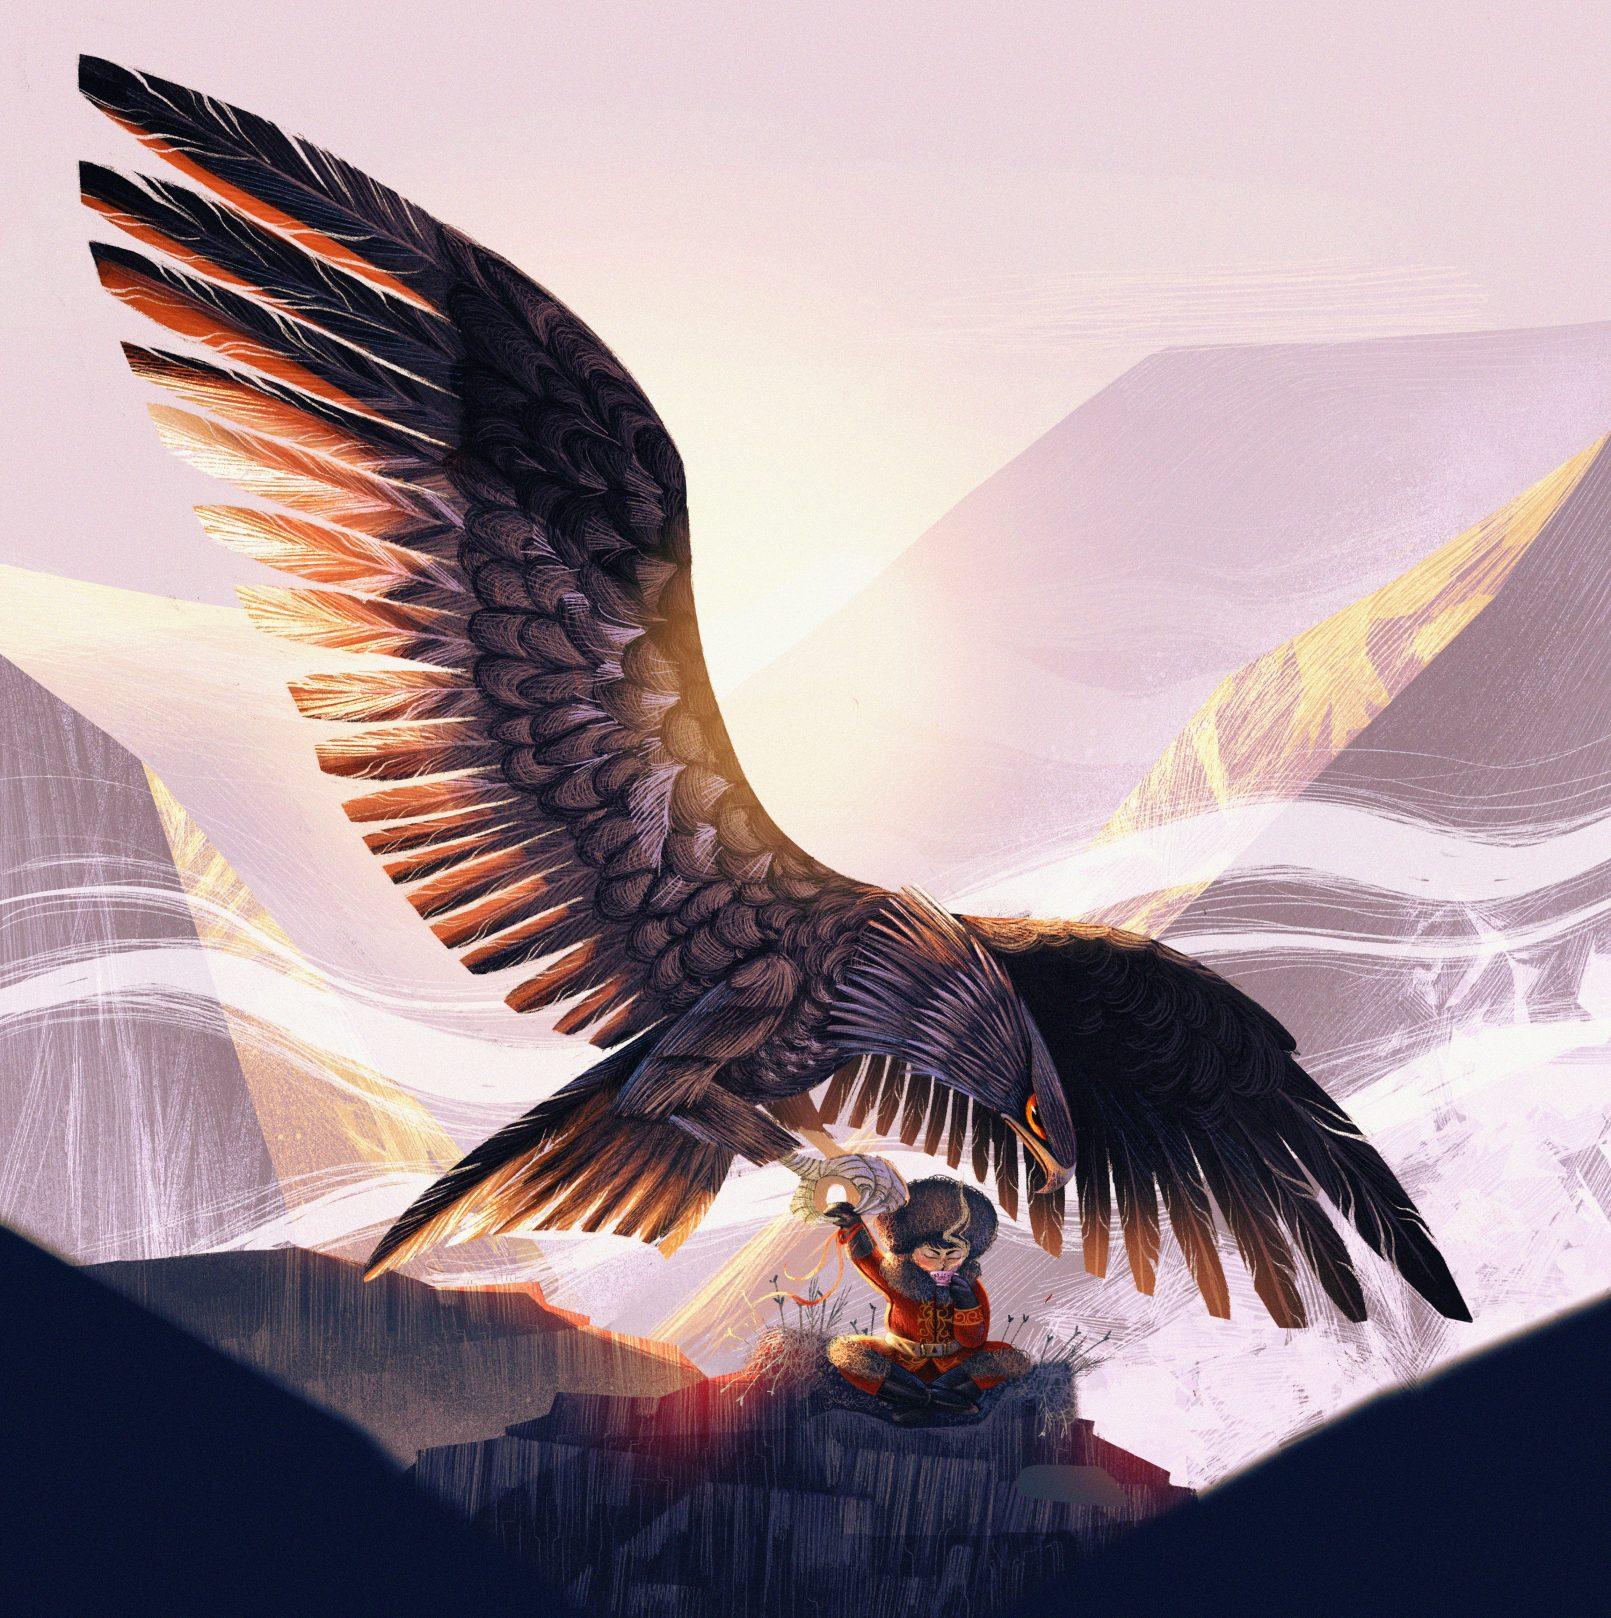 mongolian-eagle-character-design-challenge